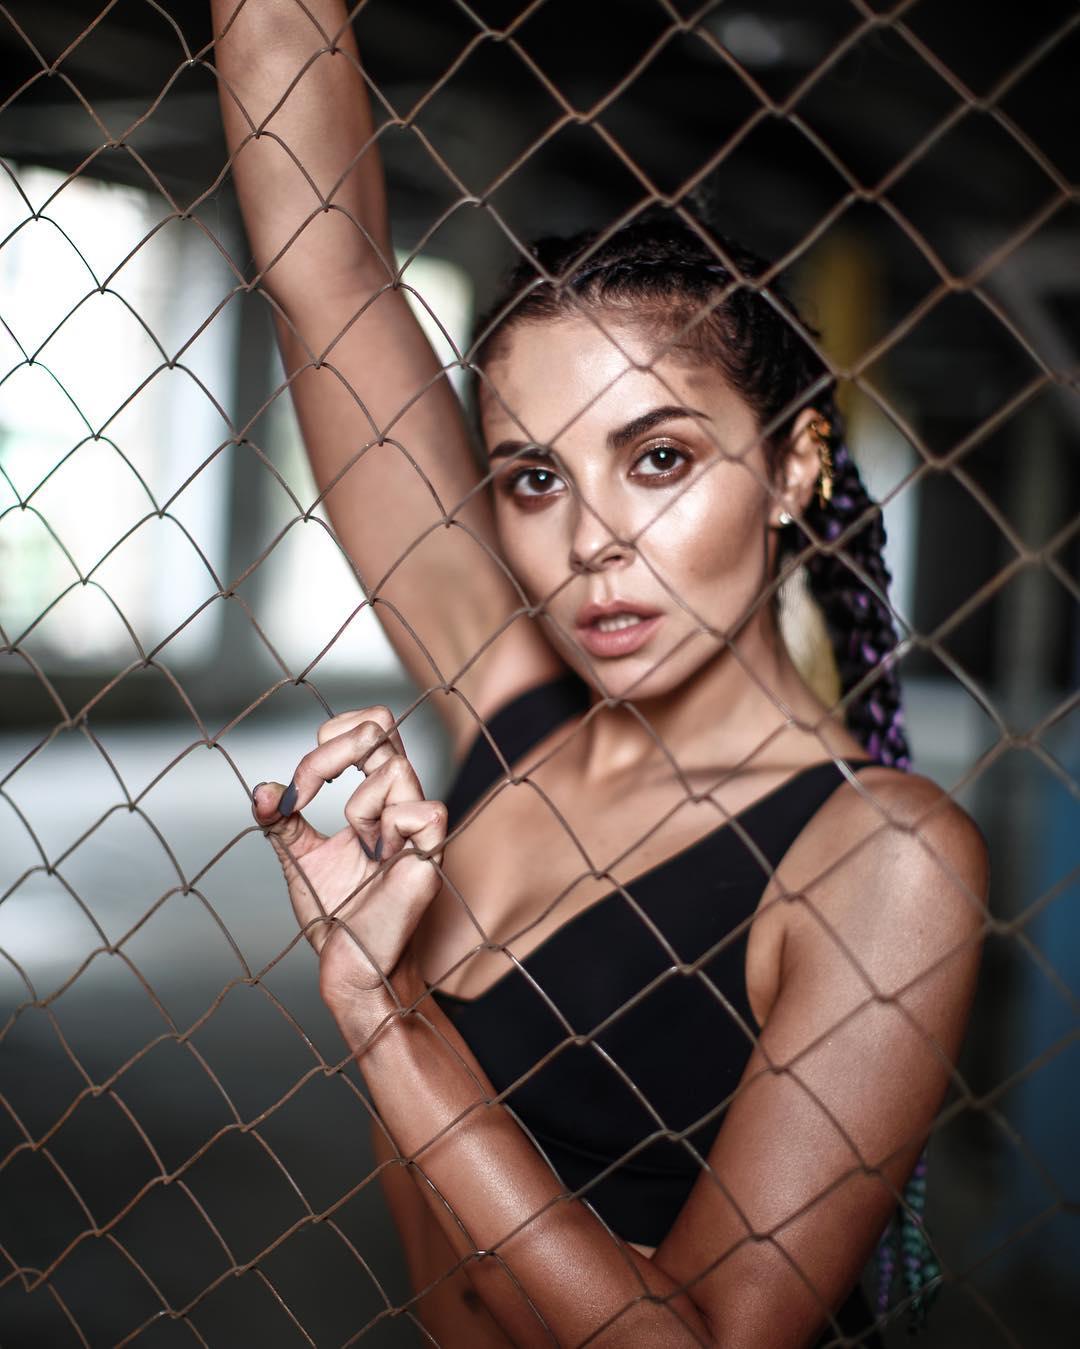 Самая сексуальная певица на икс факторе